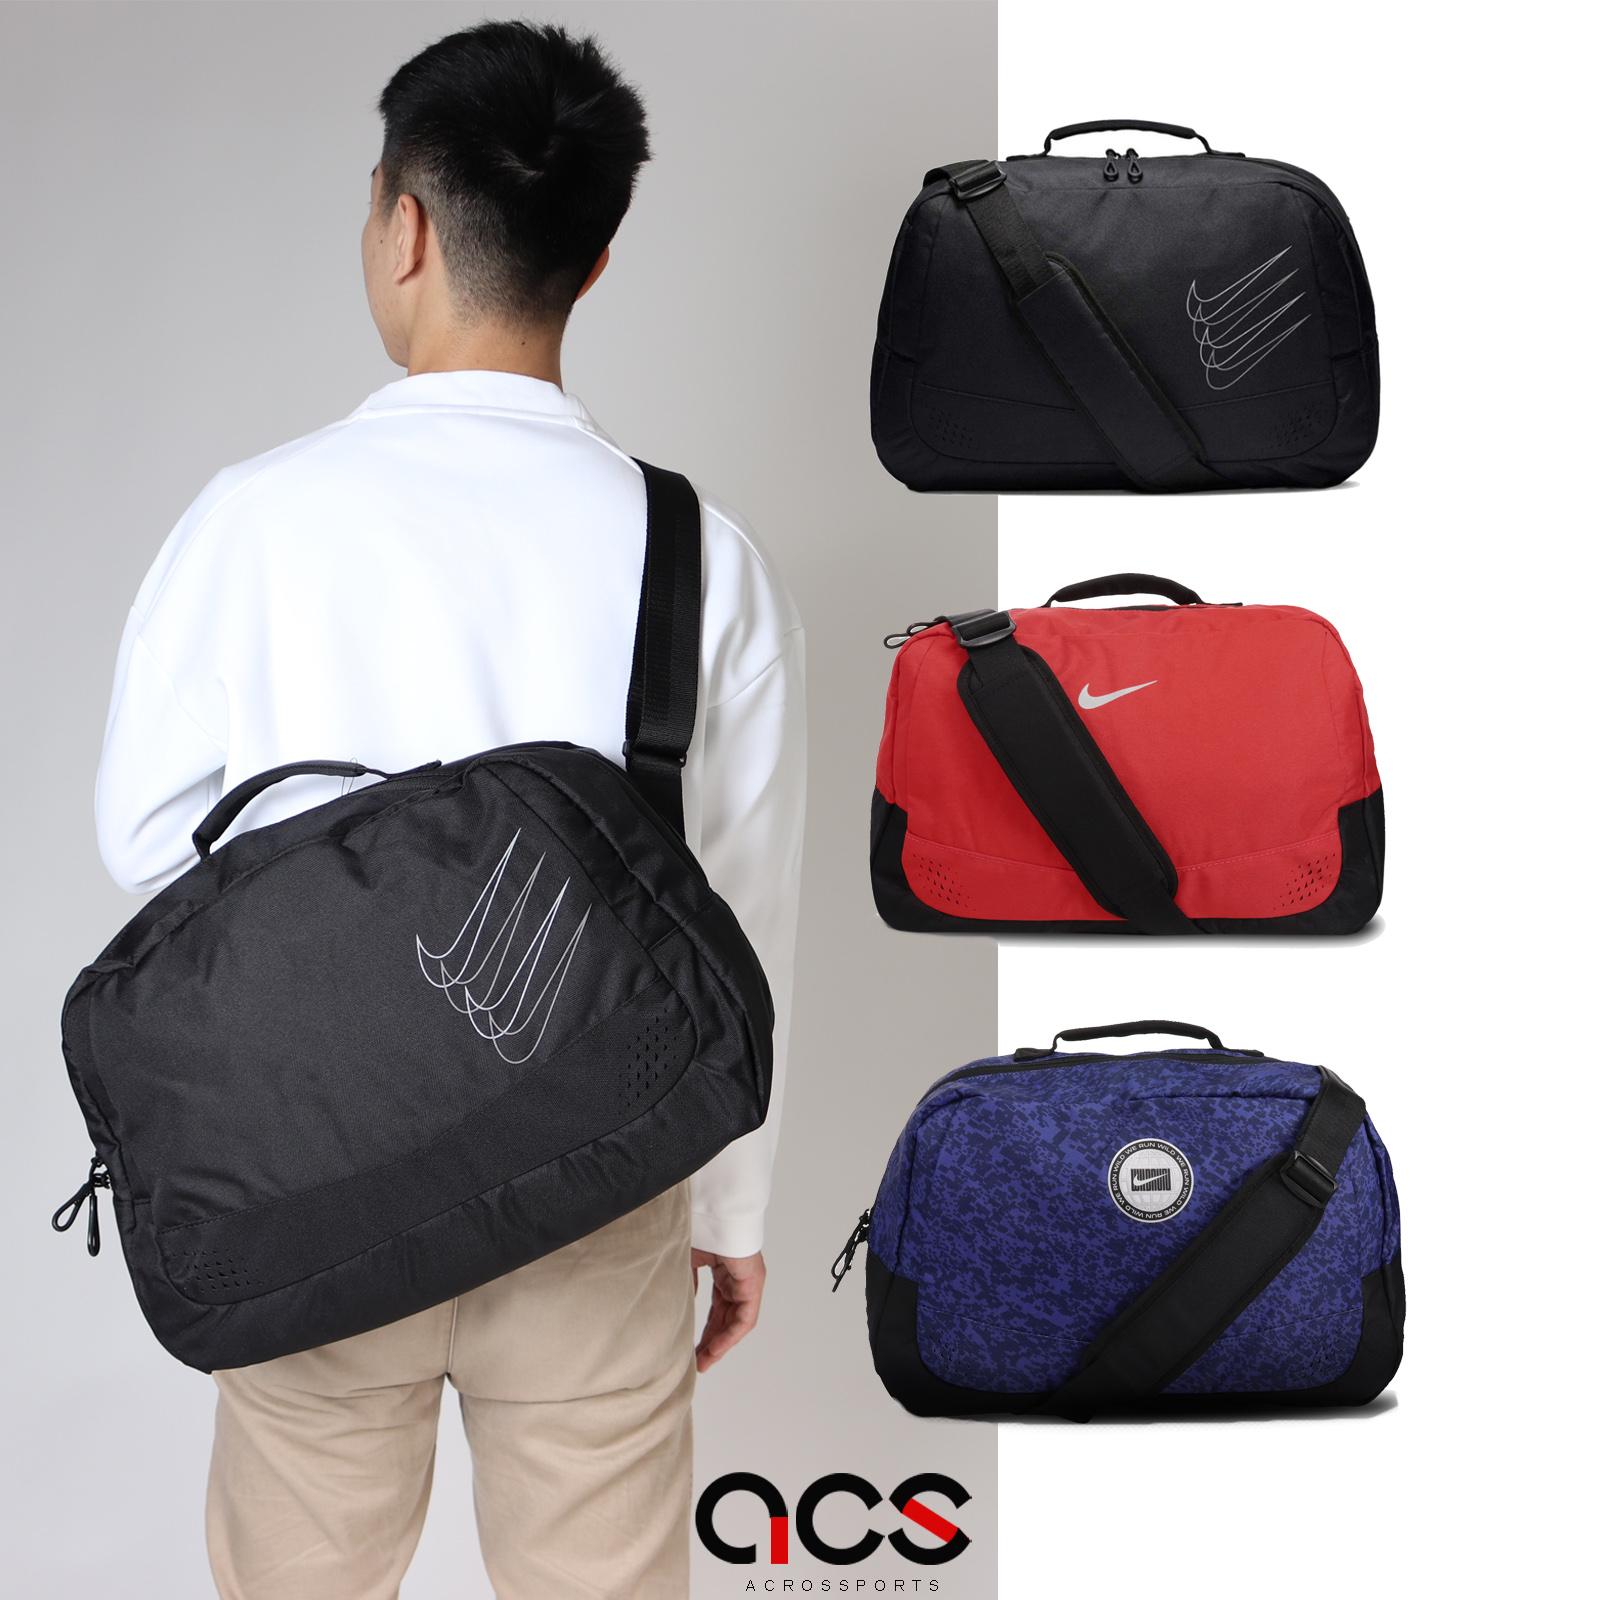 Nike 行李袋 Run Minimal Bag 男女款 運動休閒 斜背包 健身 重訓 多功能 行李袋 任選 【ACS】